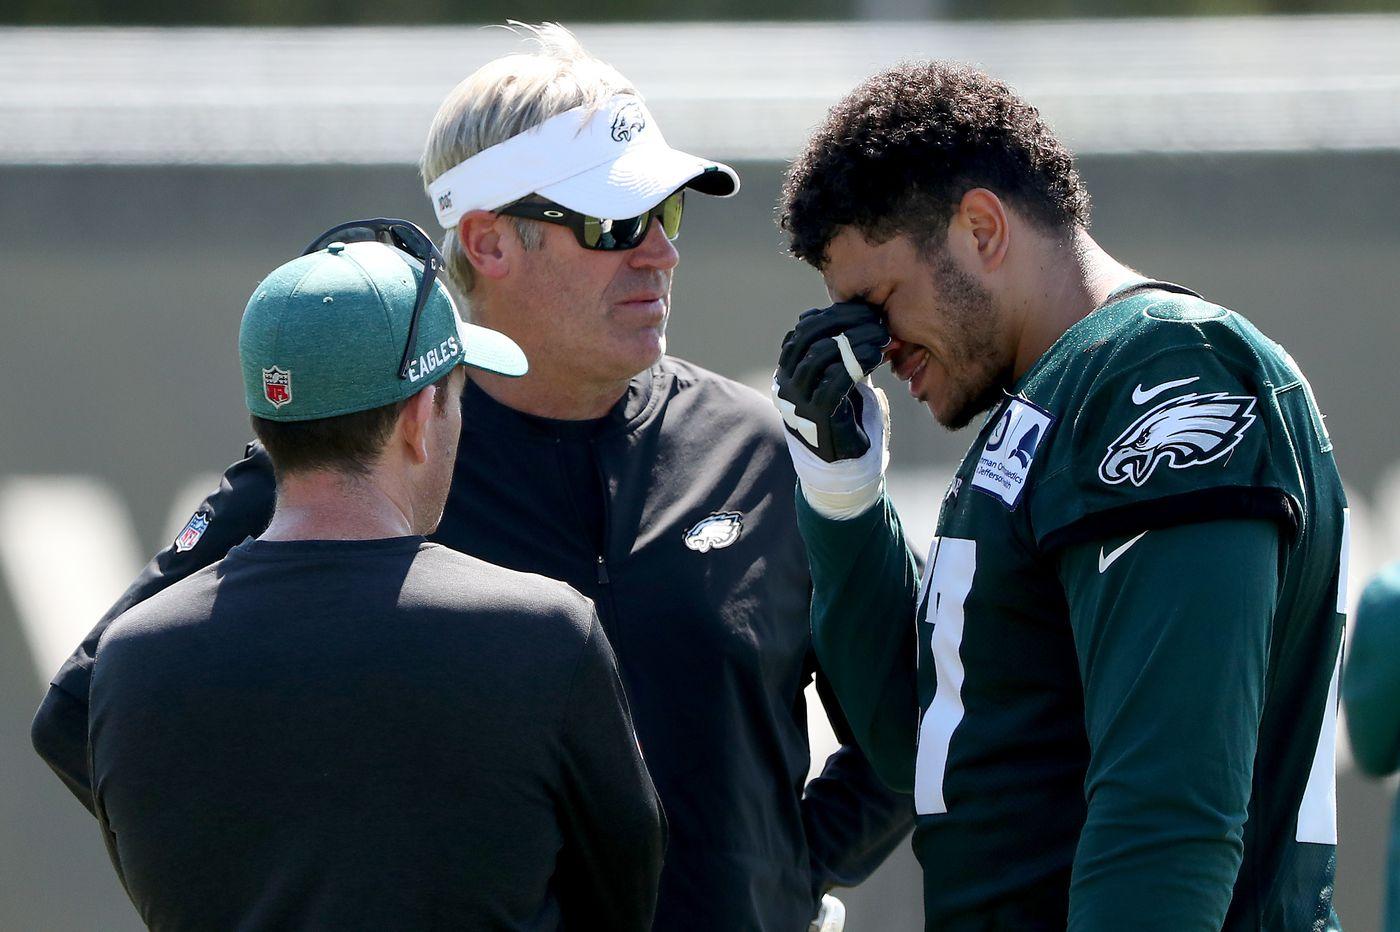 Eagles practice observations: Andre Dillard and Derek Barnett tussle as dog days heat up